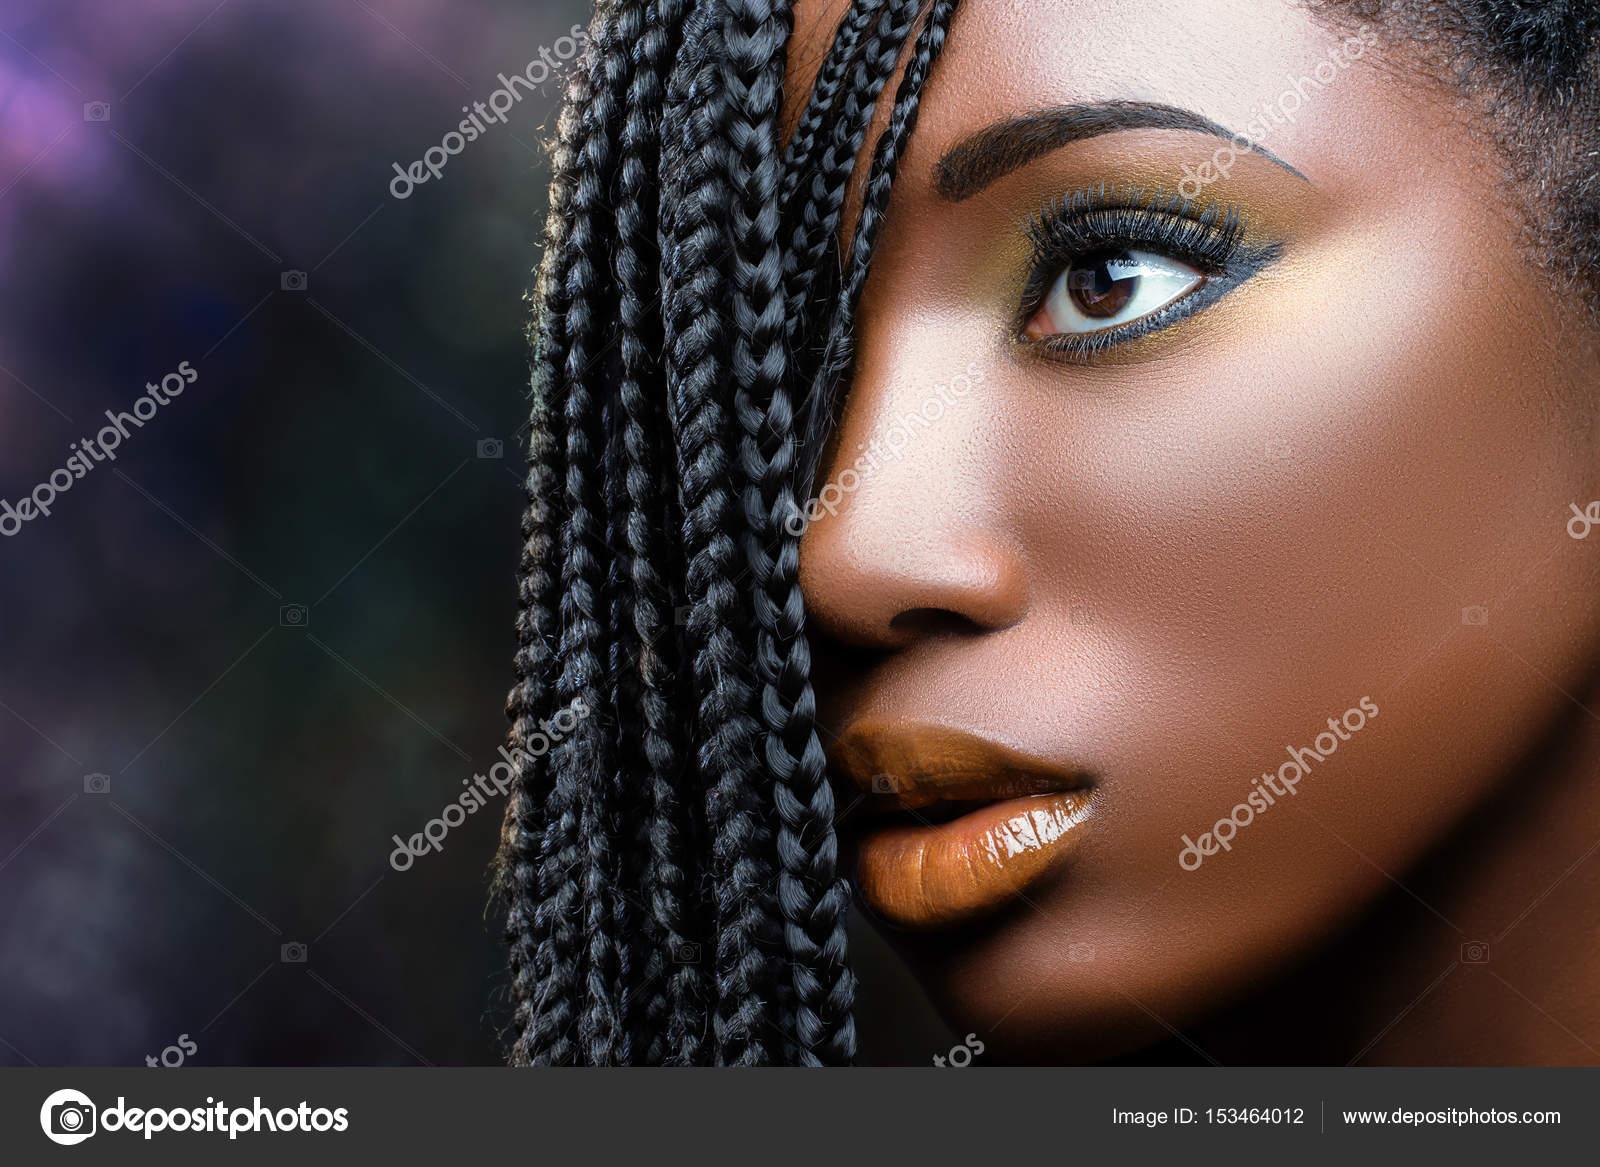 African Braids Pictures Images Stock Photos Depositphotos